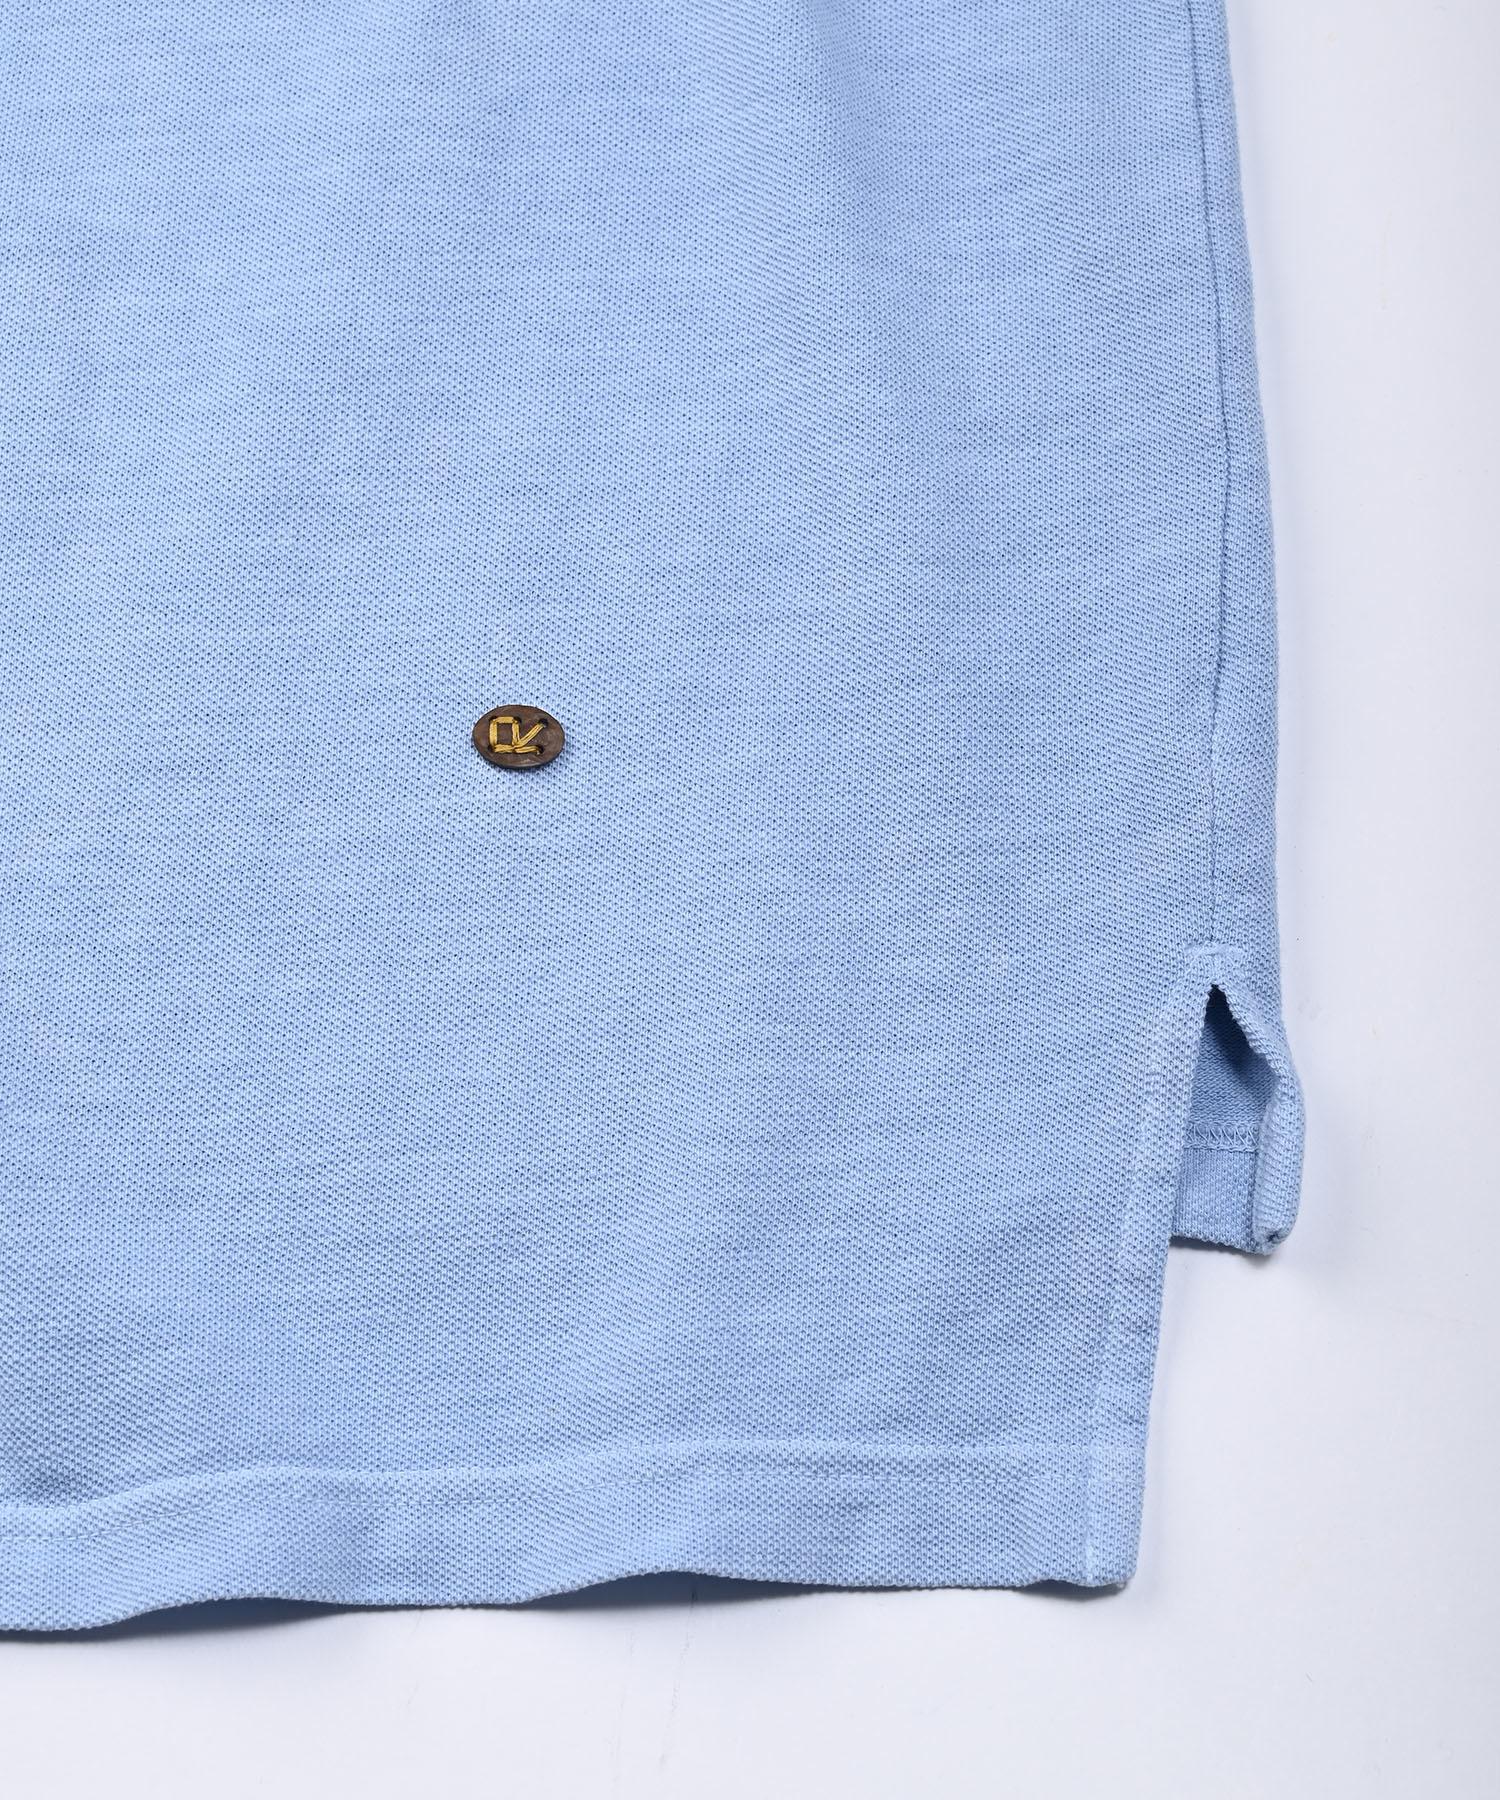 Kanoko Ocean Shiokaze Long-sleeved Polo Shirt (0421)-12